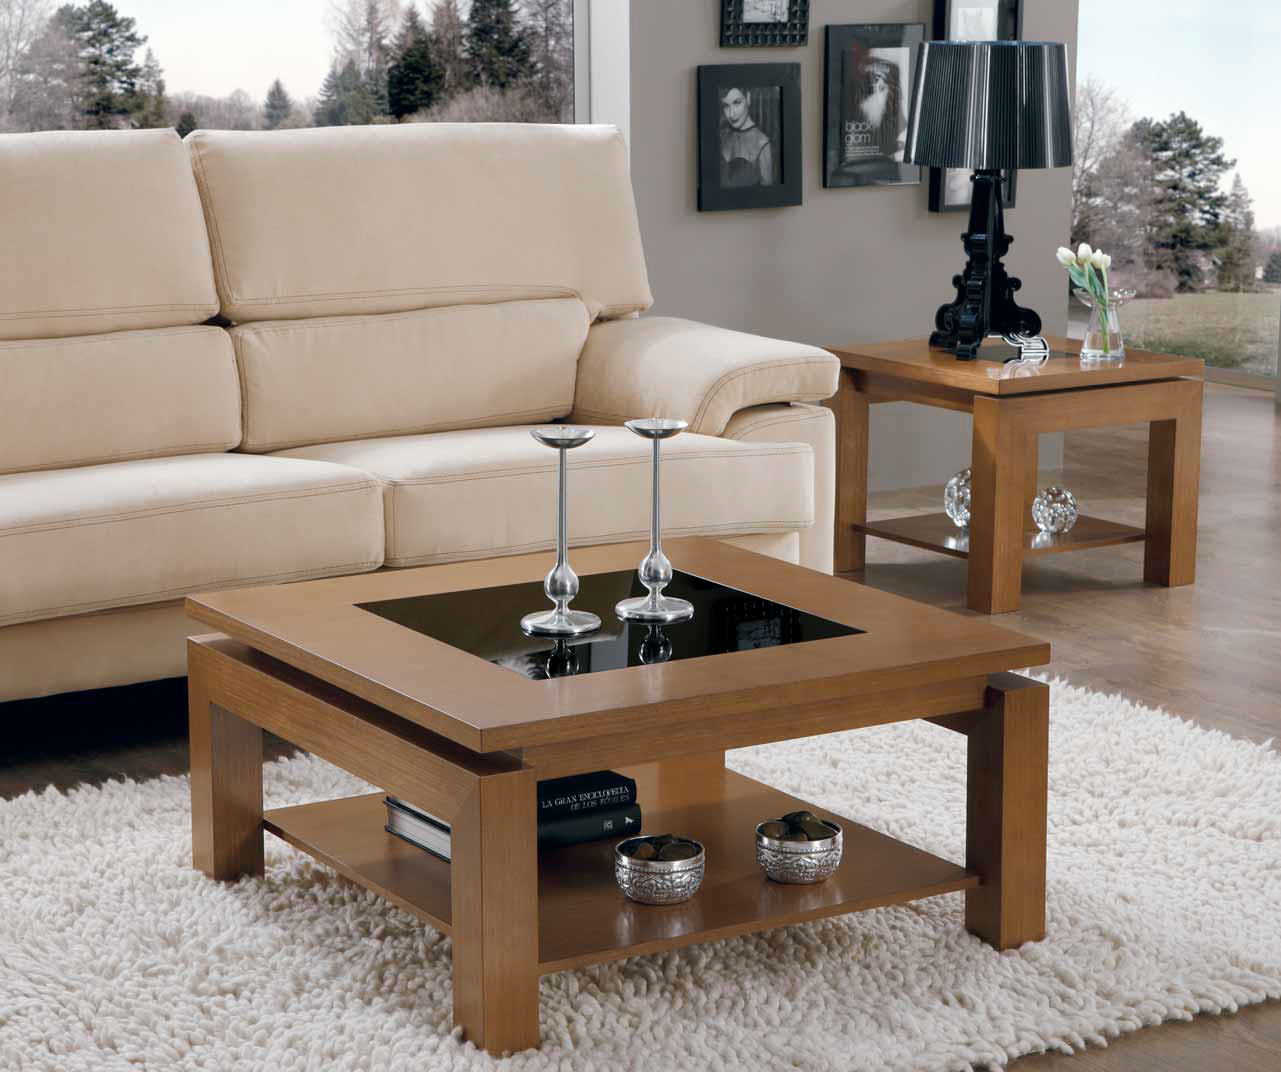 Mesa centro moderna cuadrada mejorada muebles for Diseno de mesa plegable